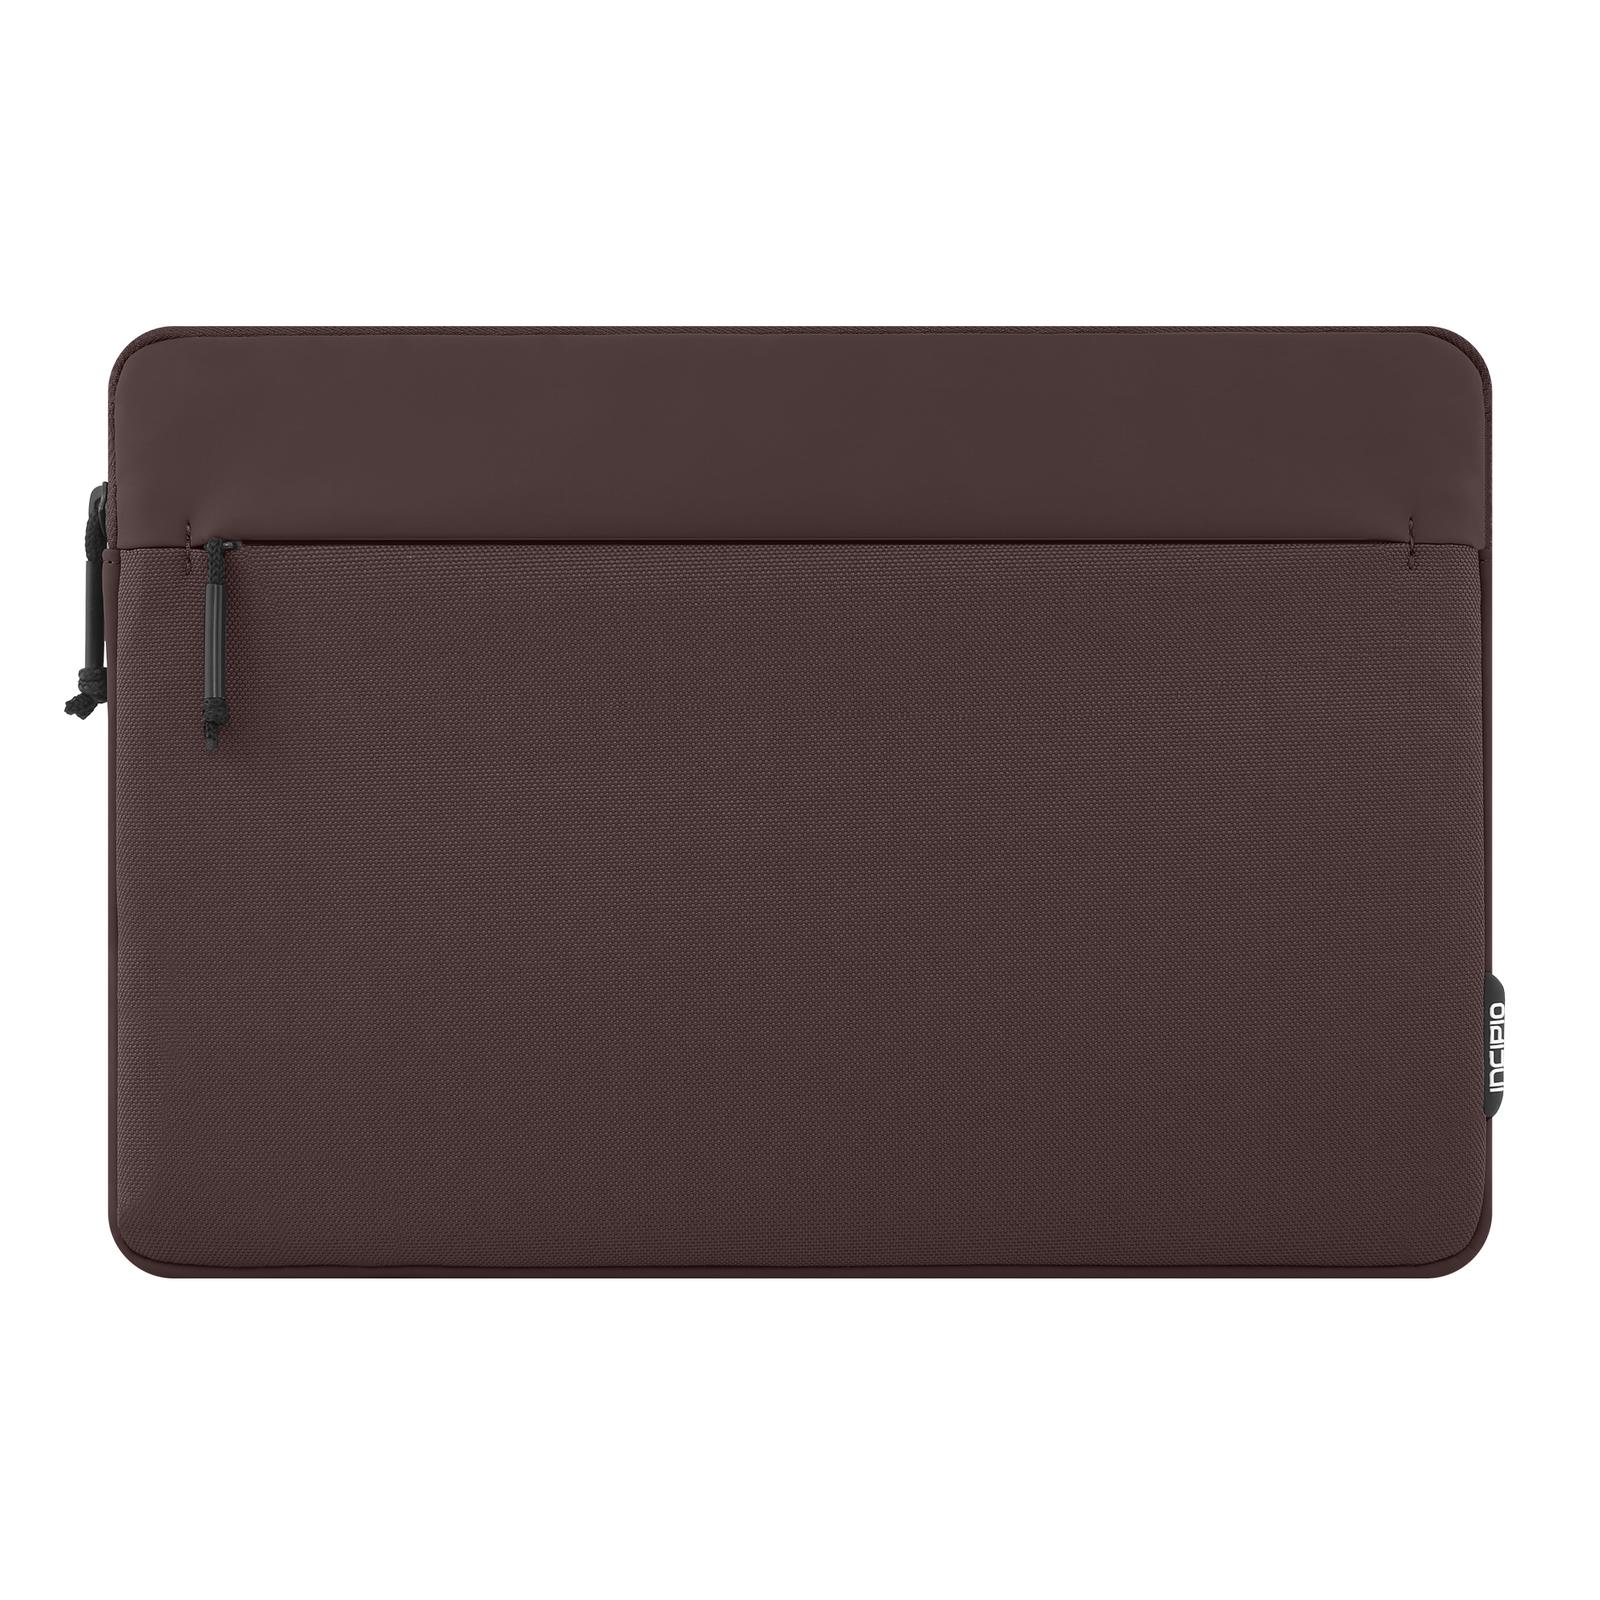 Incipio Truman Sleeve for Microsoft Surface Pro (All) - Burgandy image